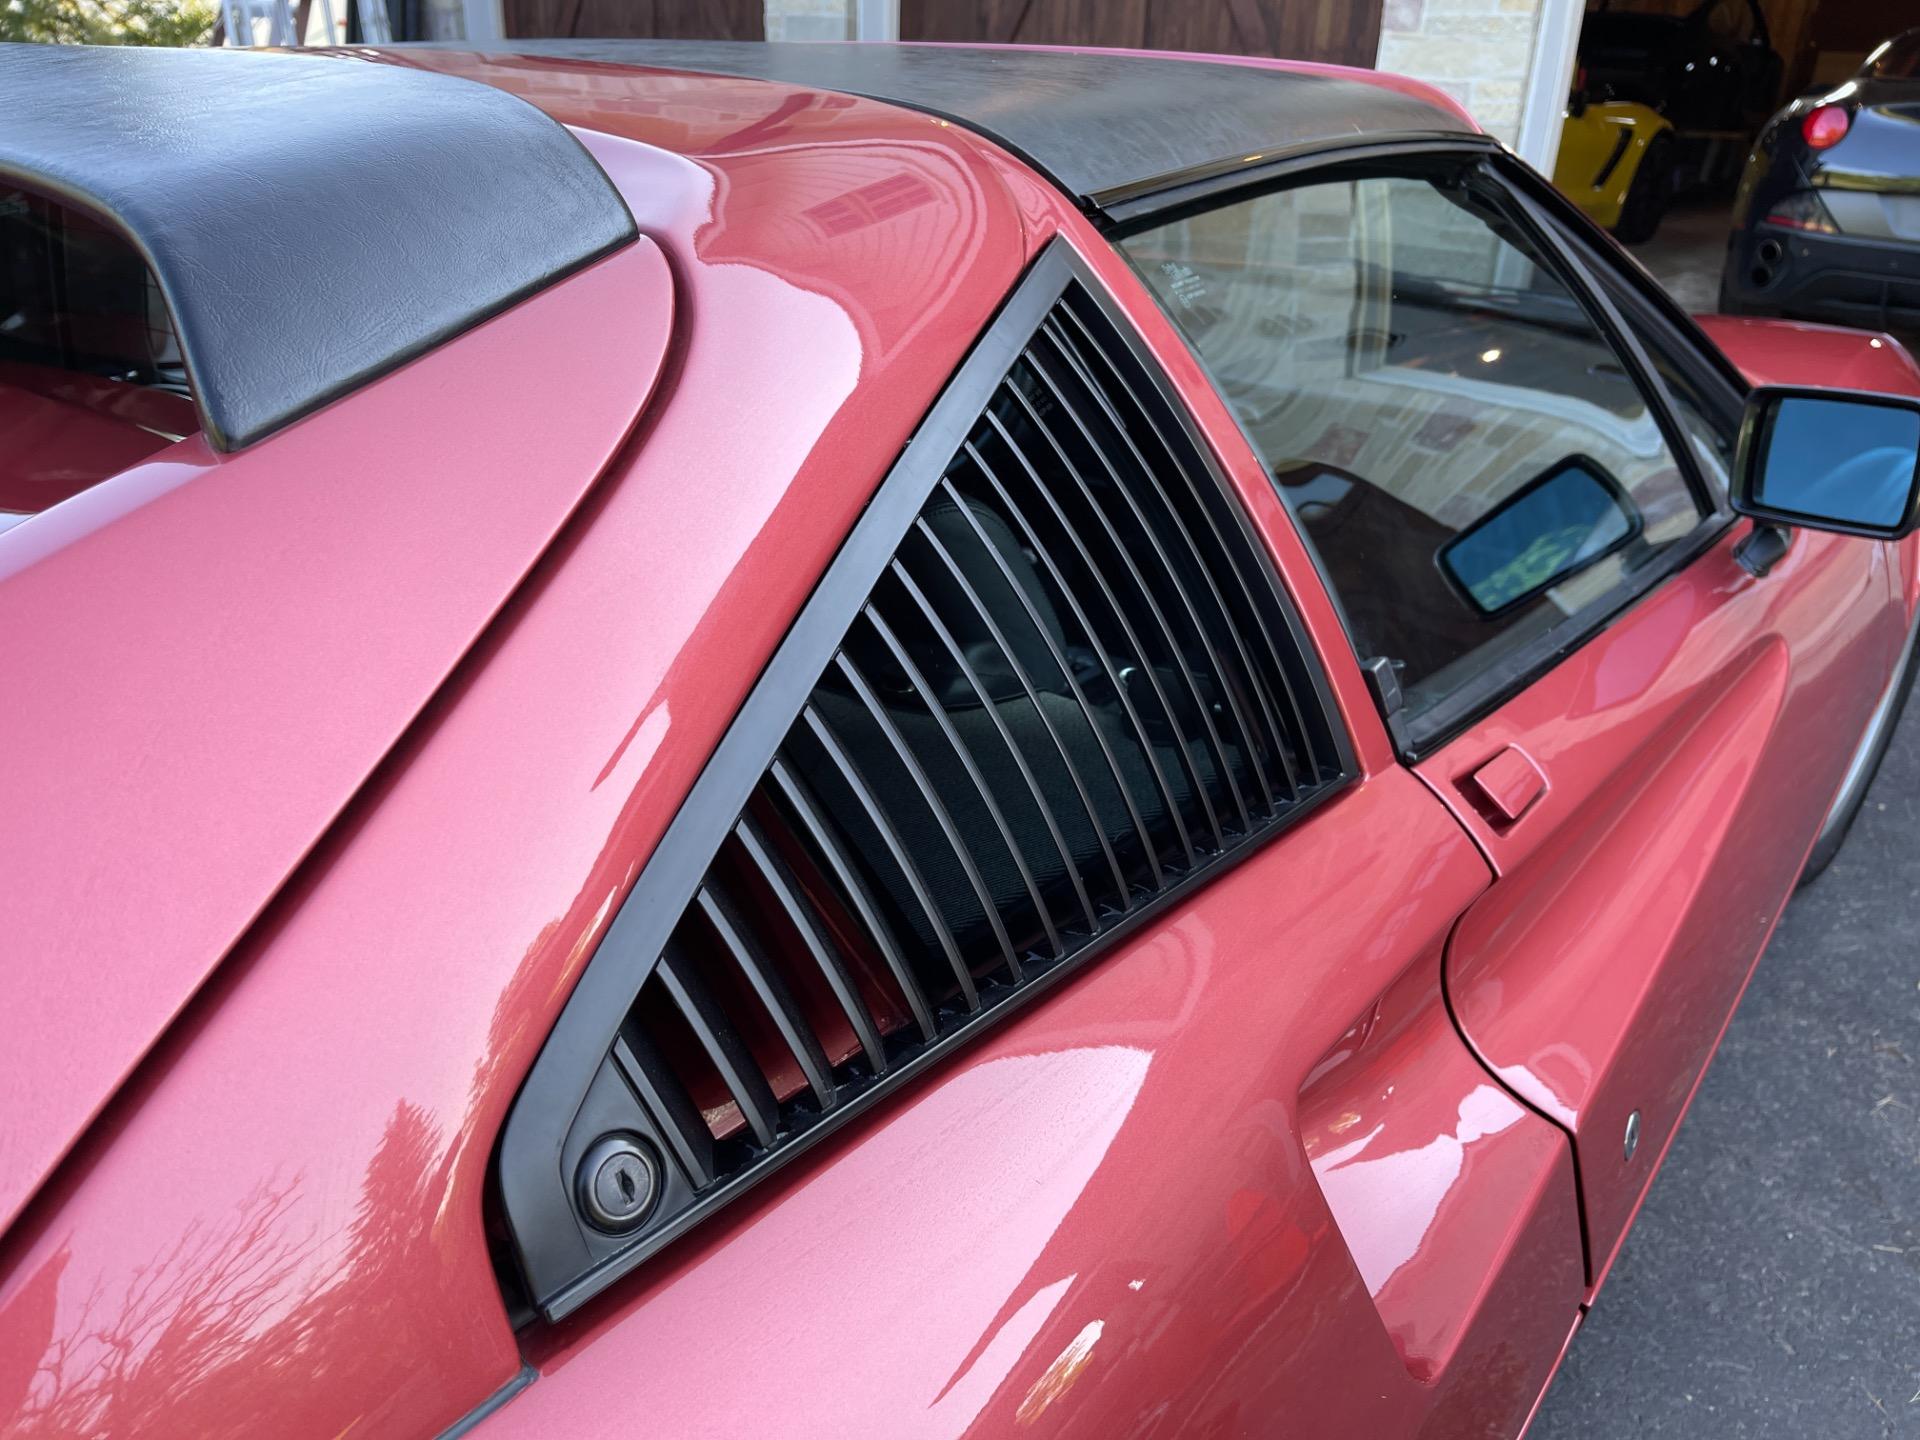 Used 1987 Ferrari 328 GTS Low Mile Italian Exotic | Mundelein, IL